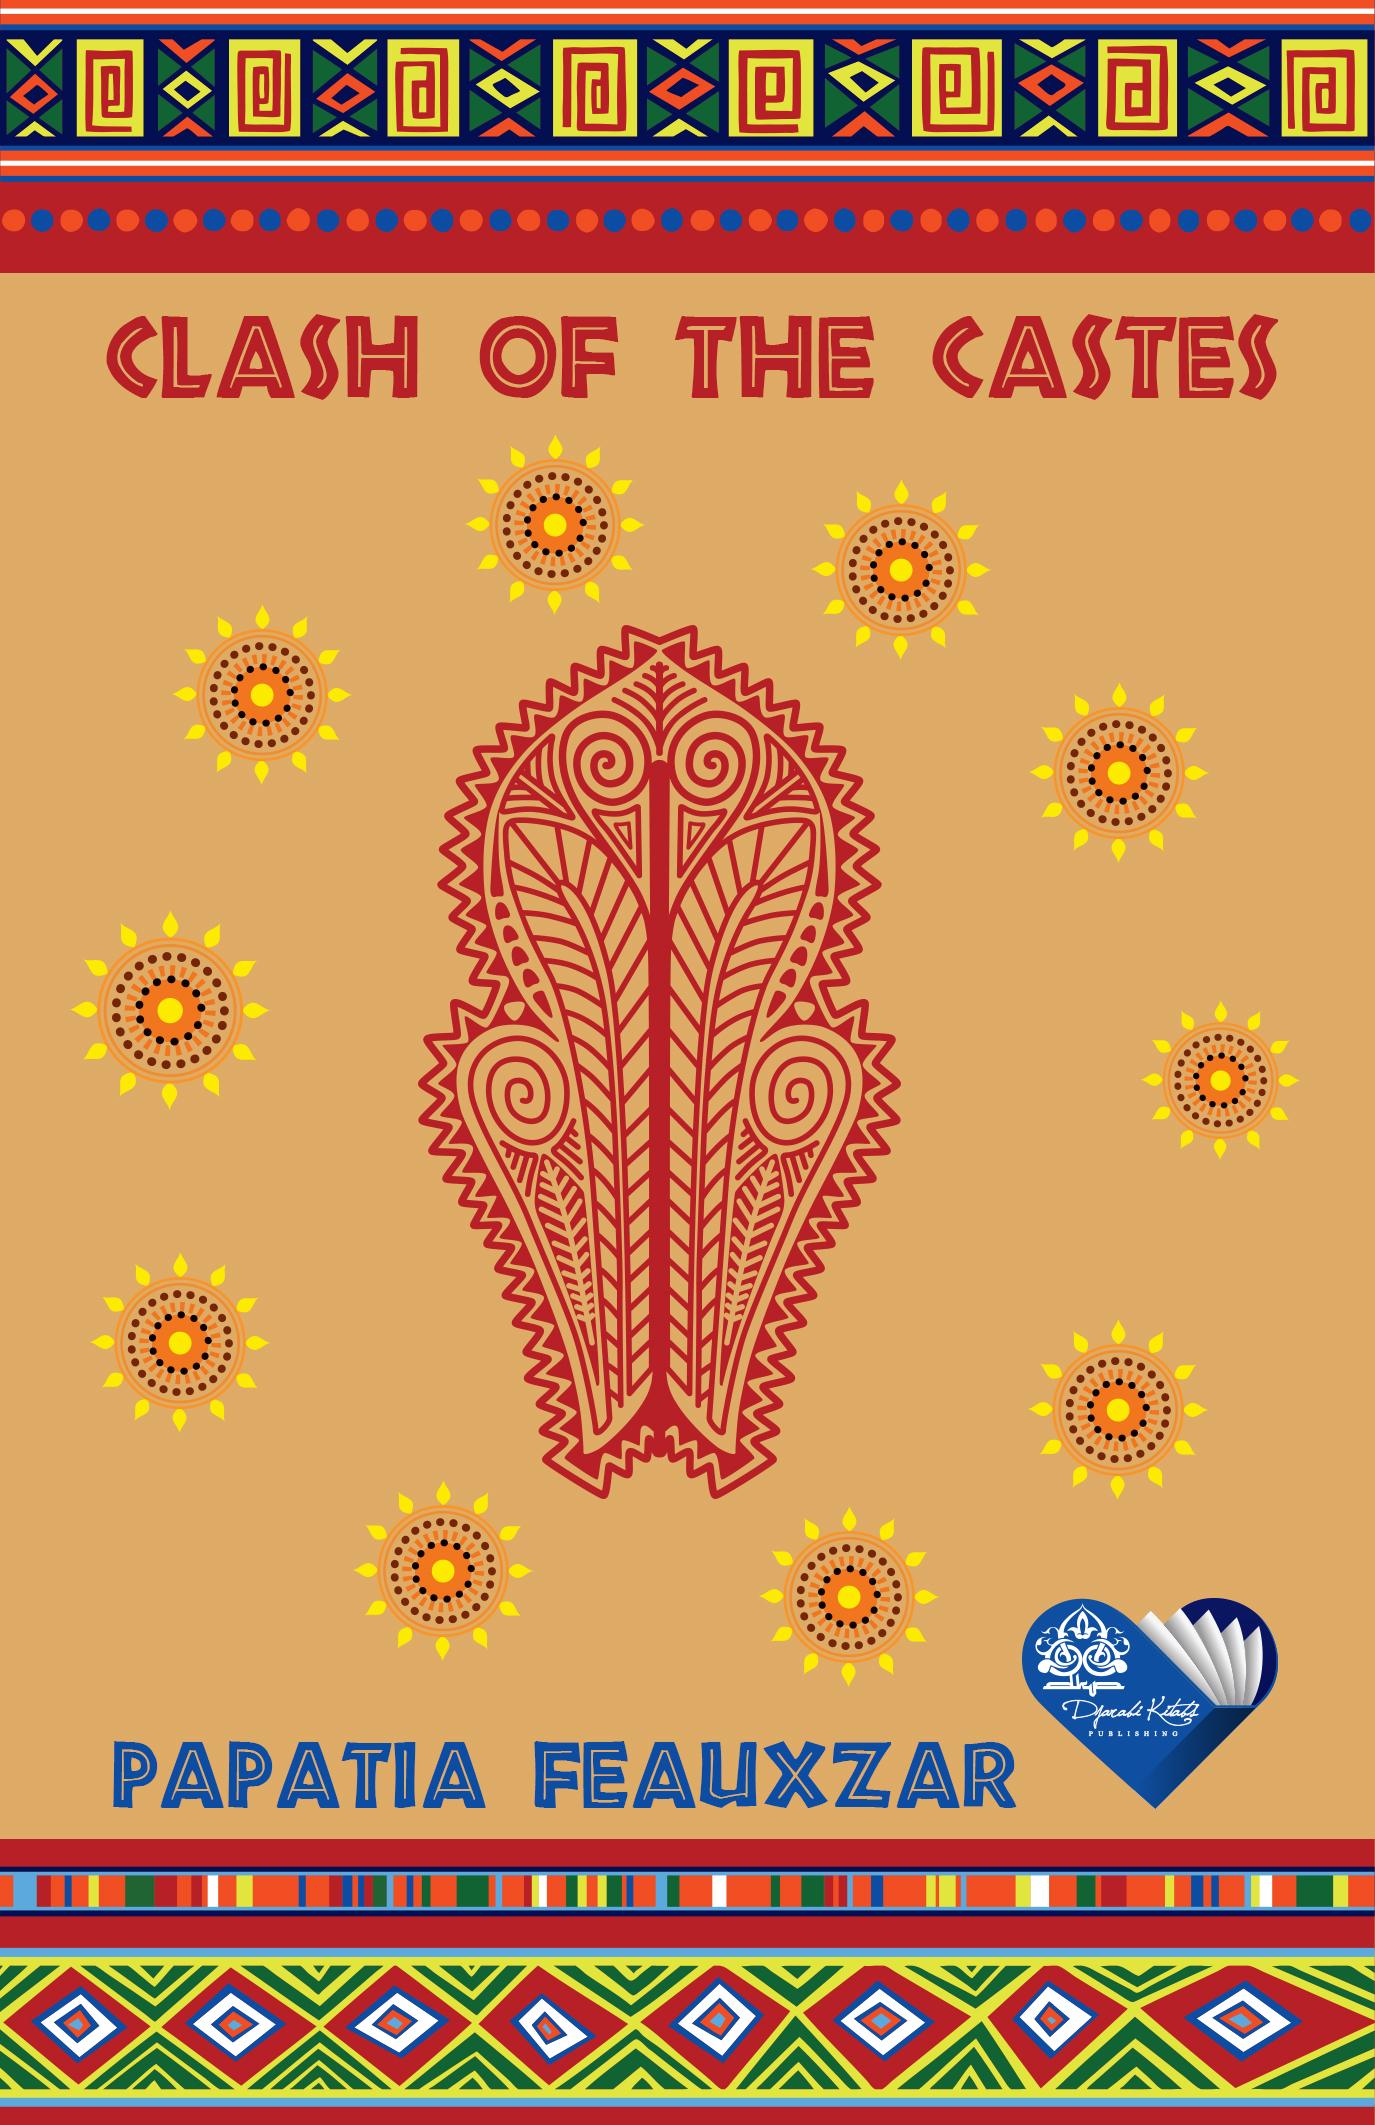 Clash of the Castes02.jpg